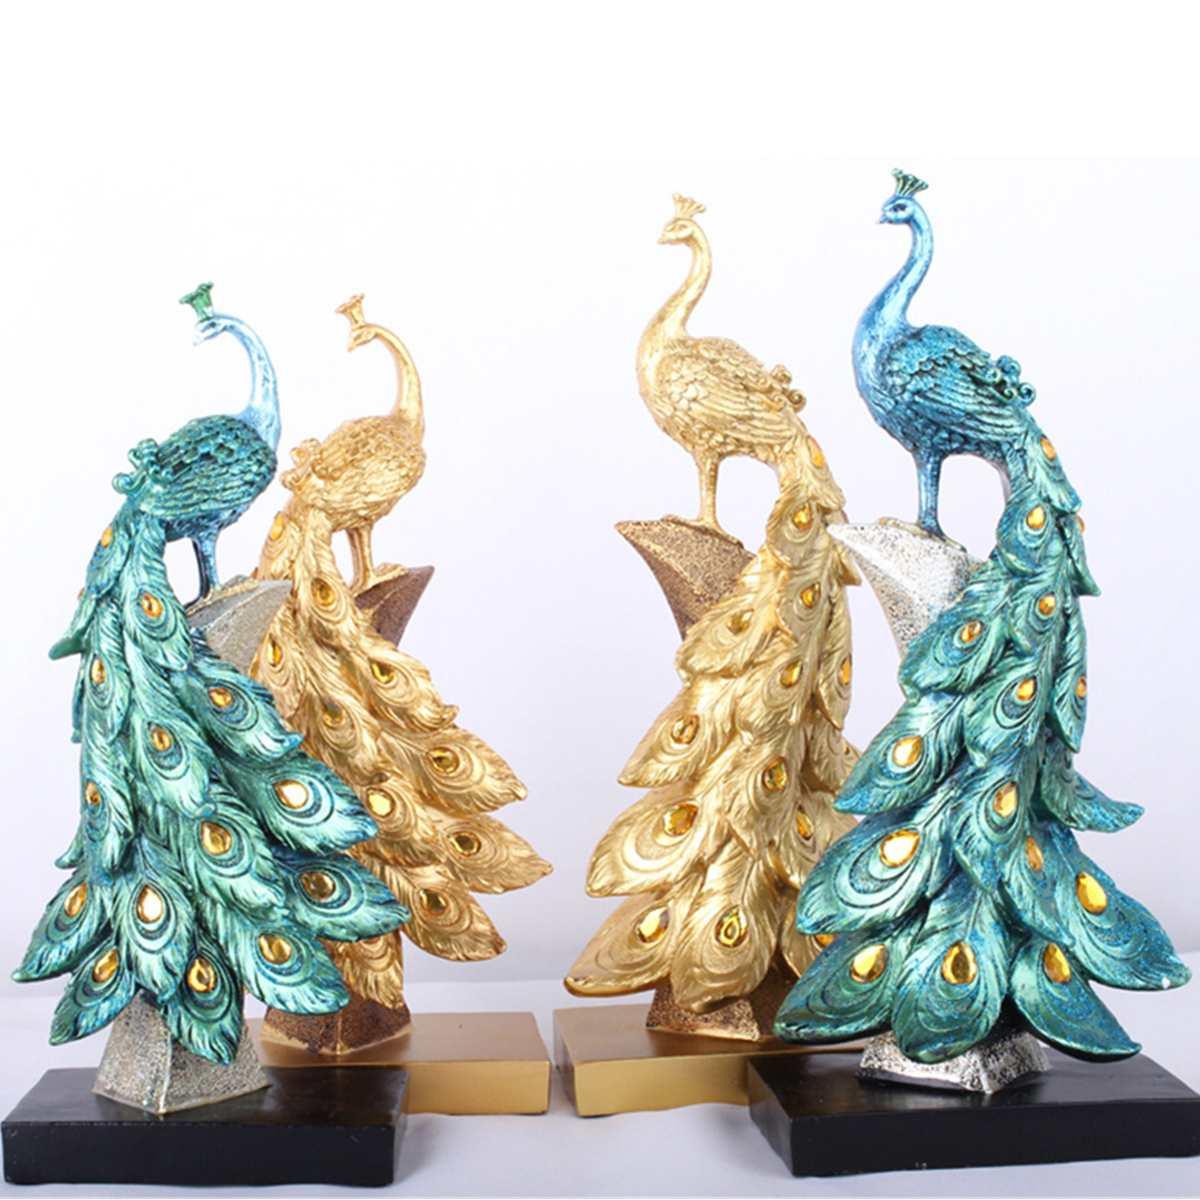 Exotic Peacock Resin Decoration Crafts Desktop Ornament Decorations Figurine Miniatures Statue Sculpture Home Decor